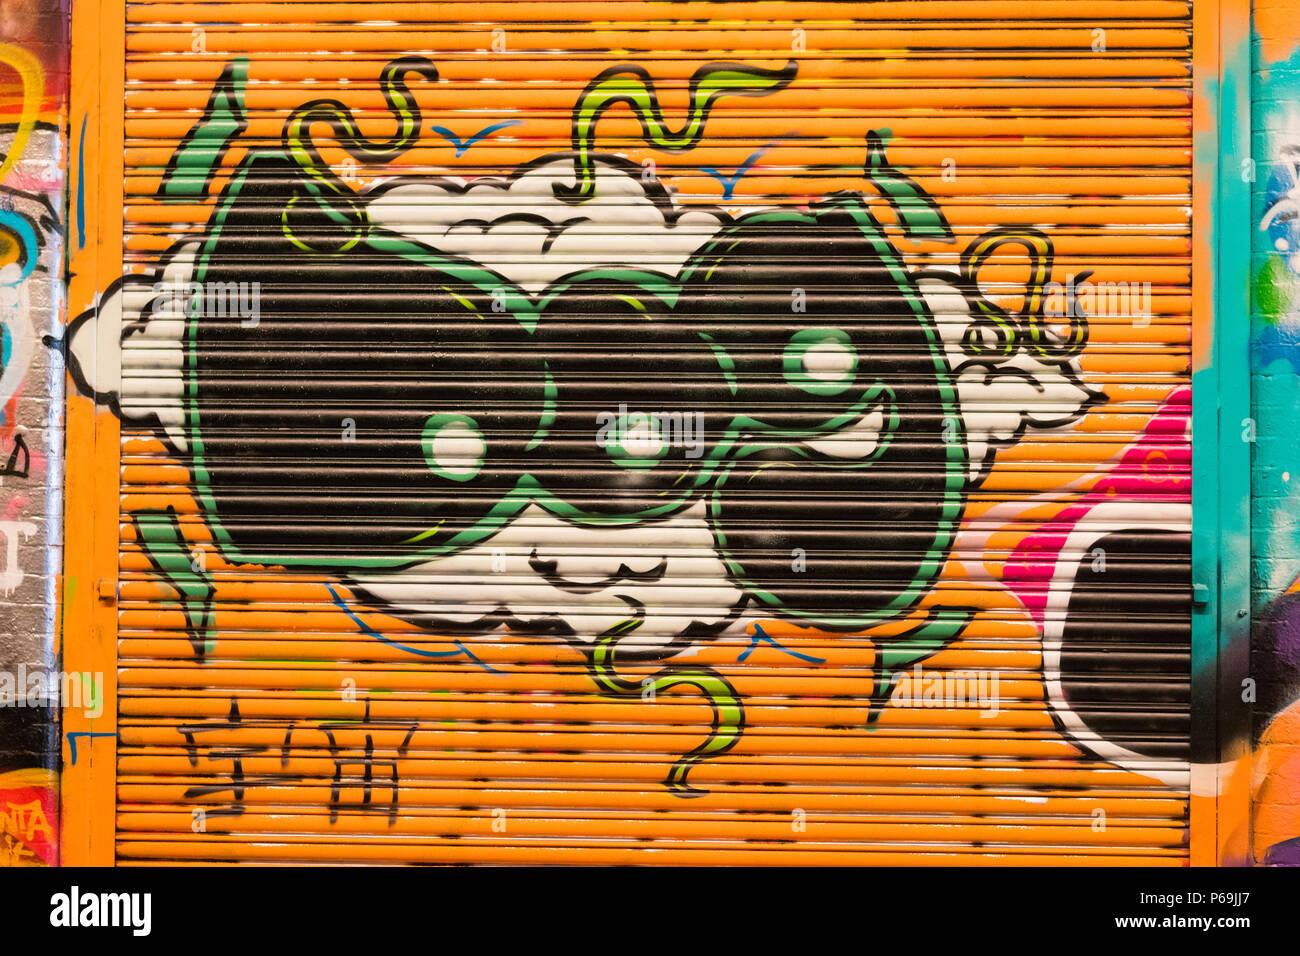 London Waterloo Leake Street graffiti letters DOG on cloud on orange roller shutter - Stock Image